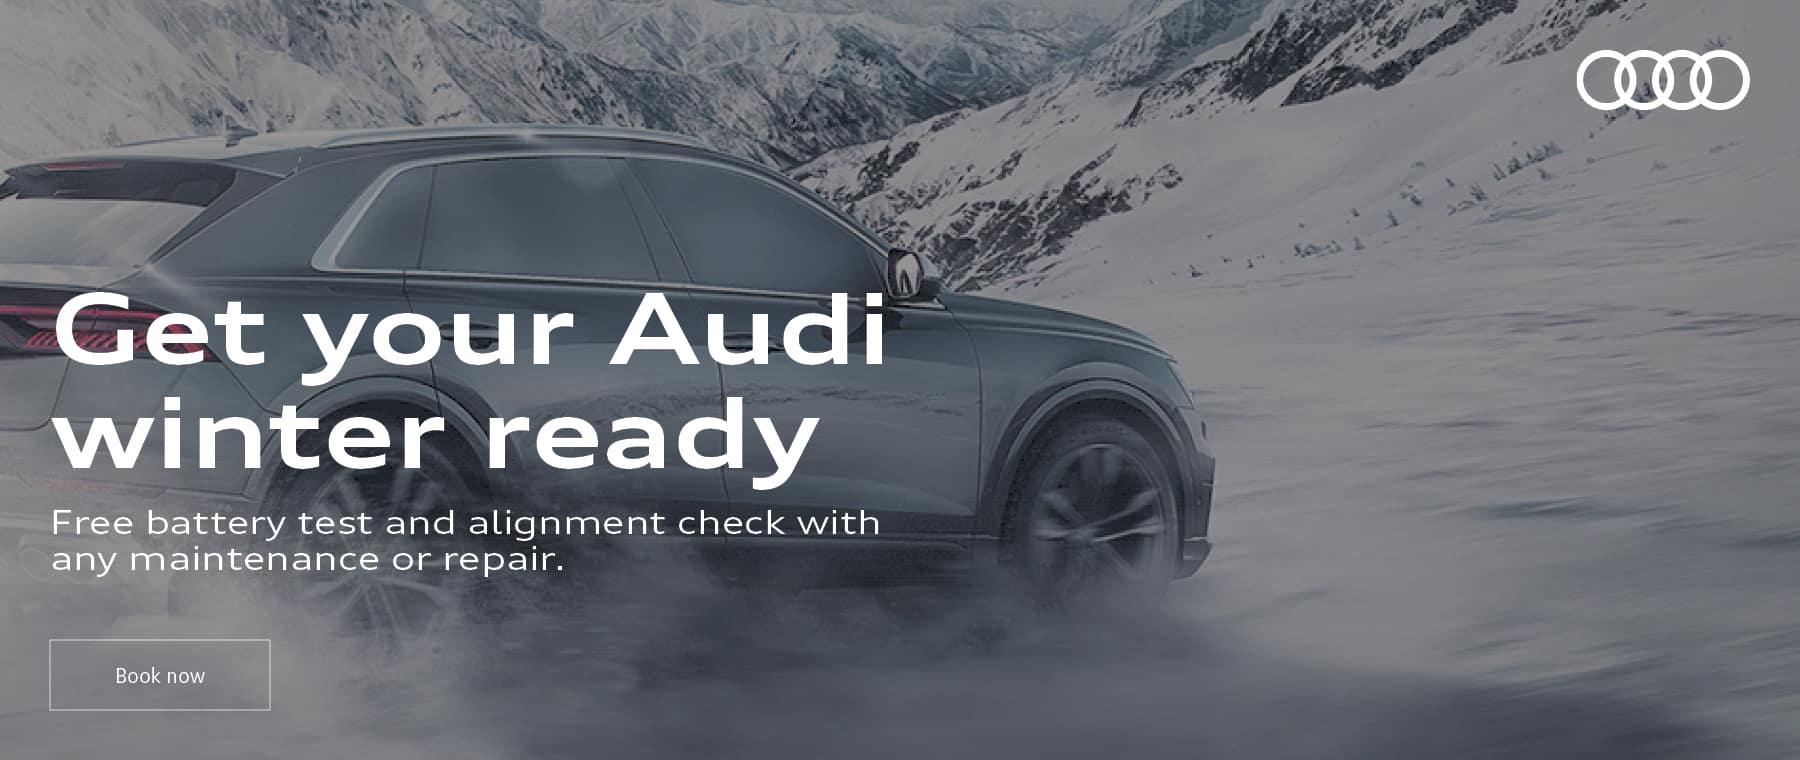 Audi-Wpg-January-Promotion_-_Web-Banner